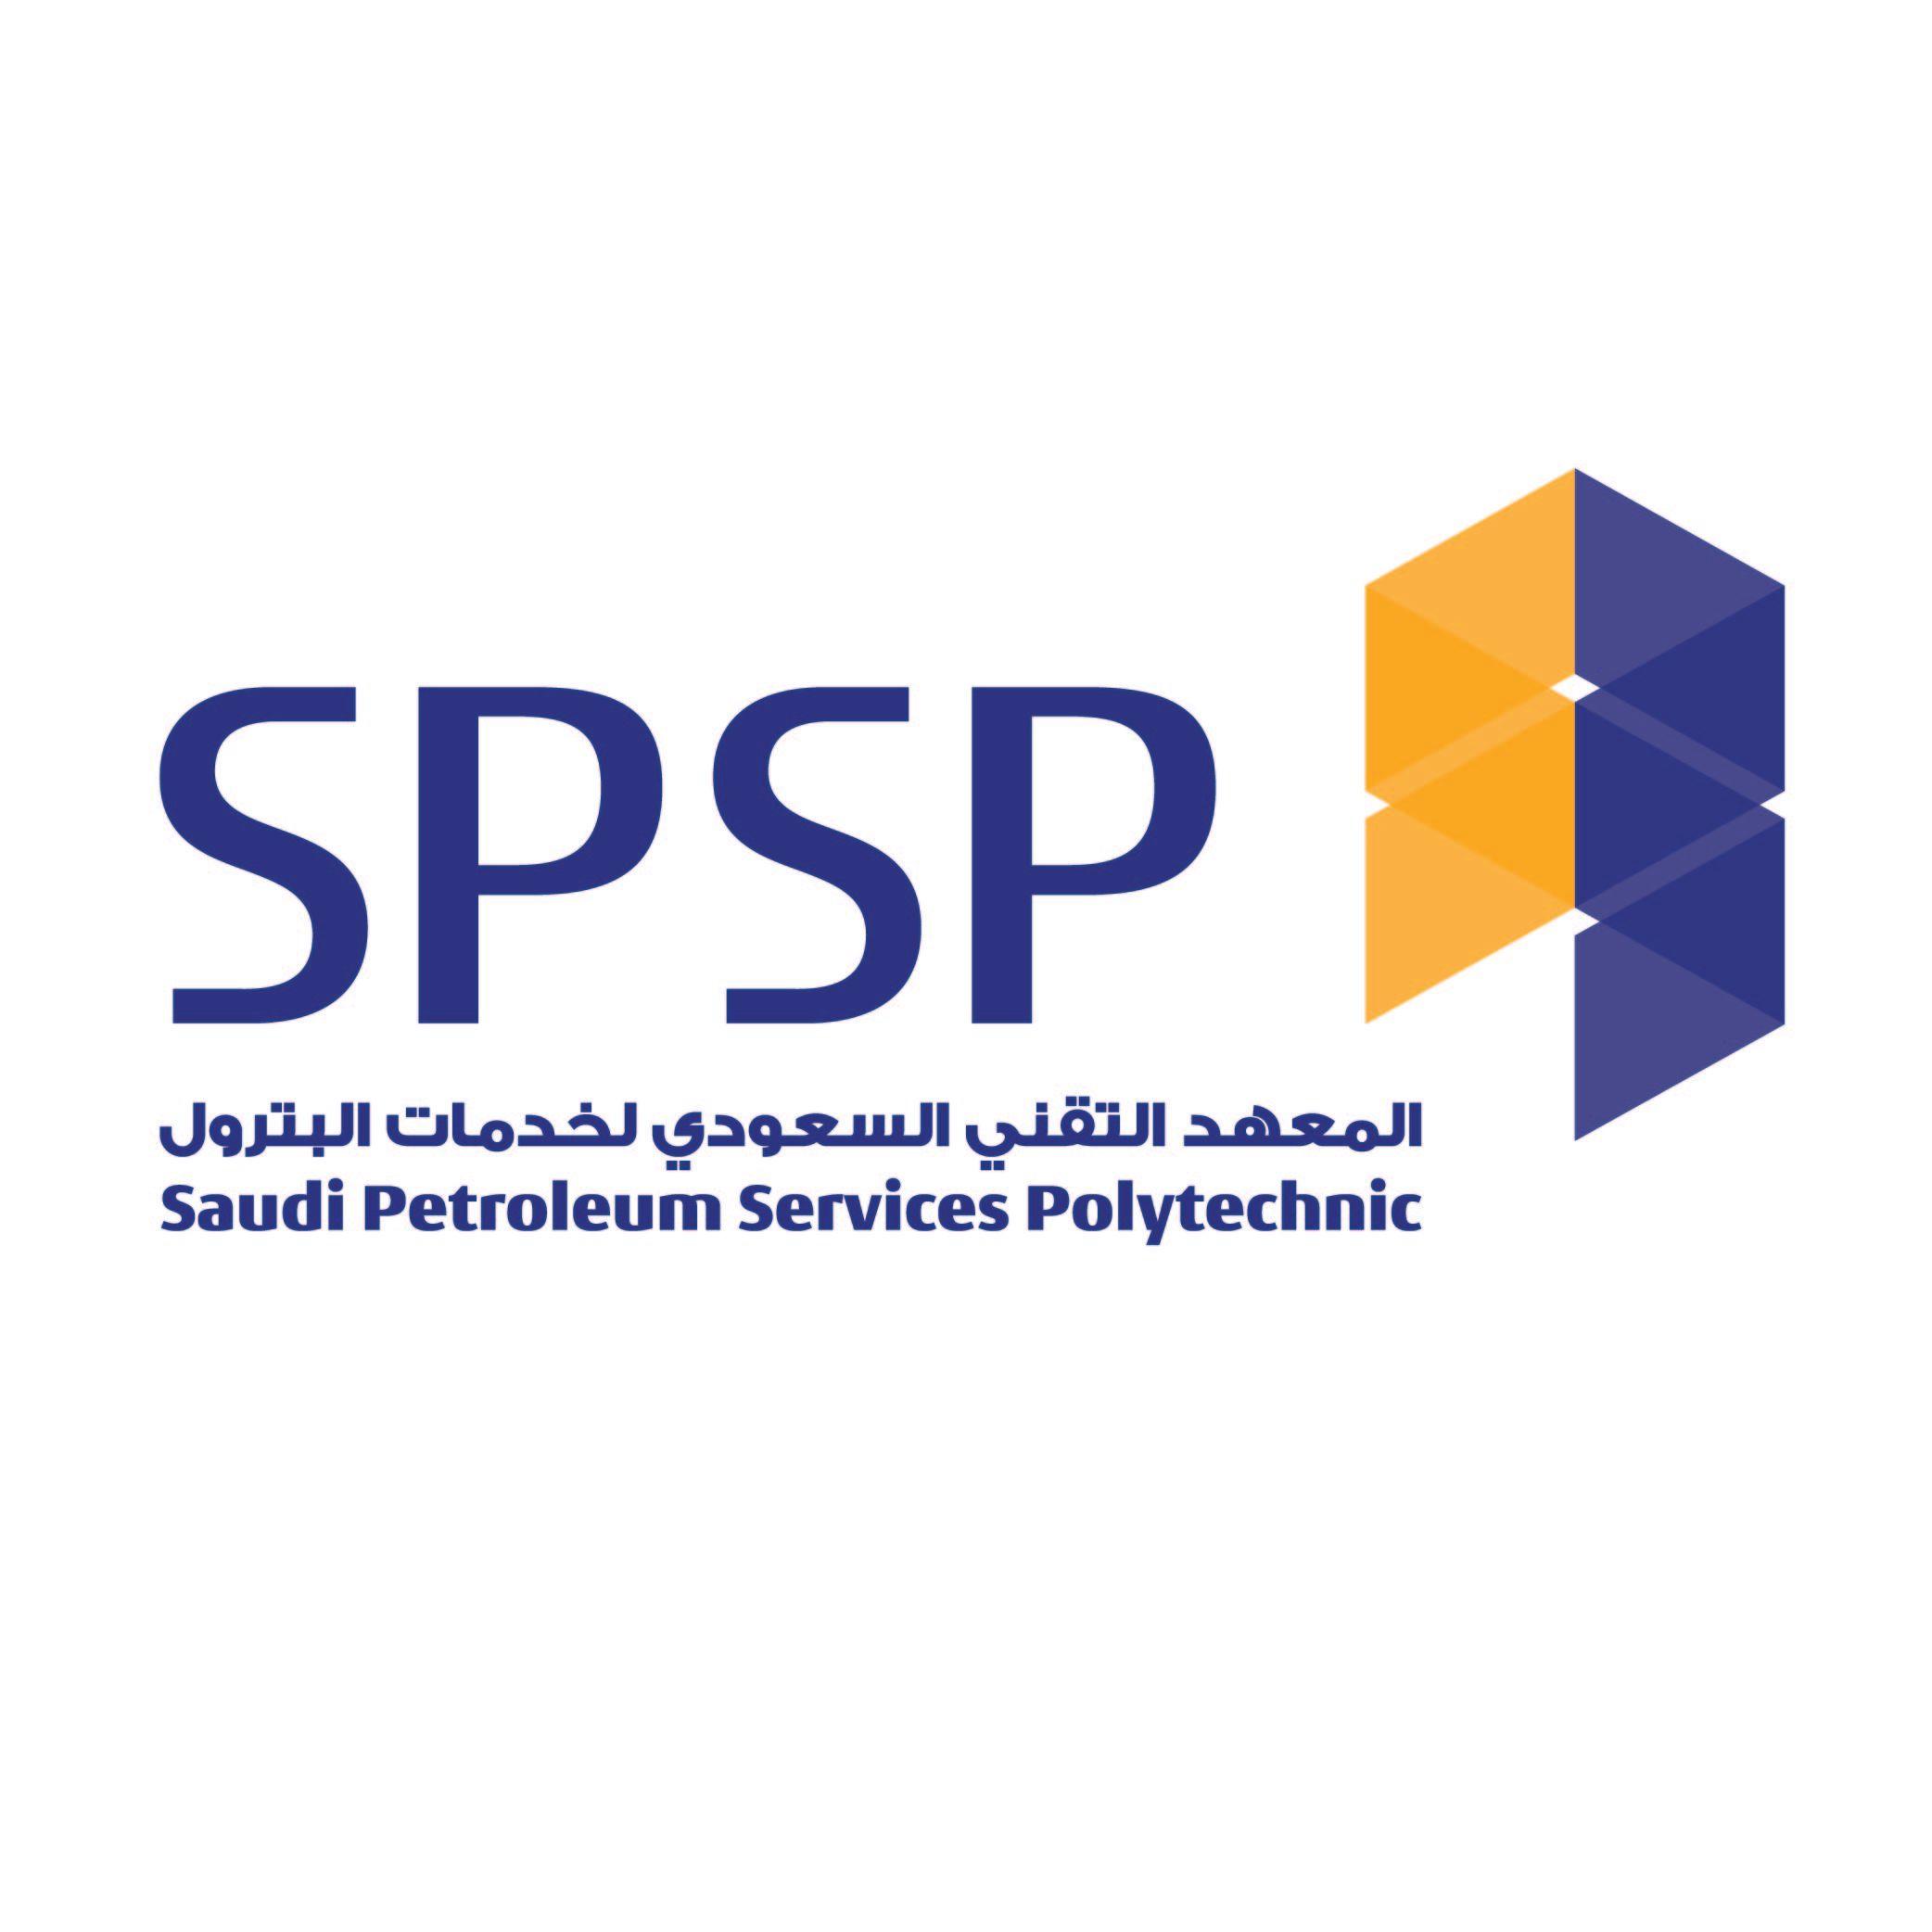 Saudi Petroleum Services Polytechnic (SPSP)